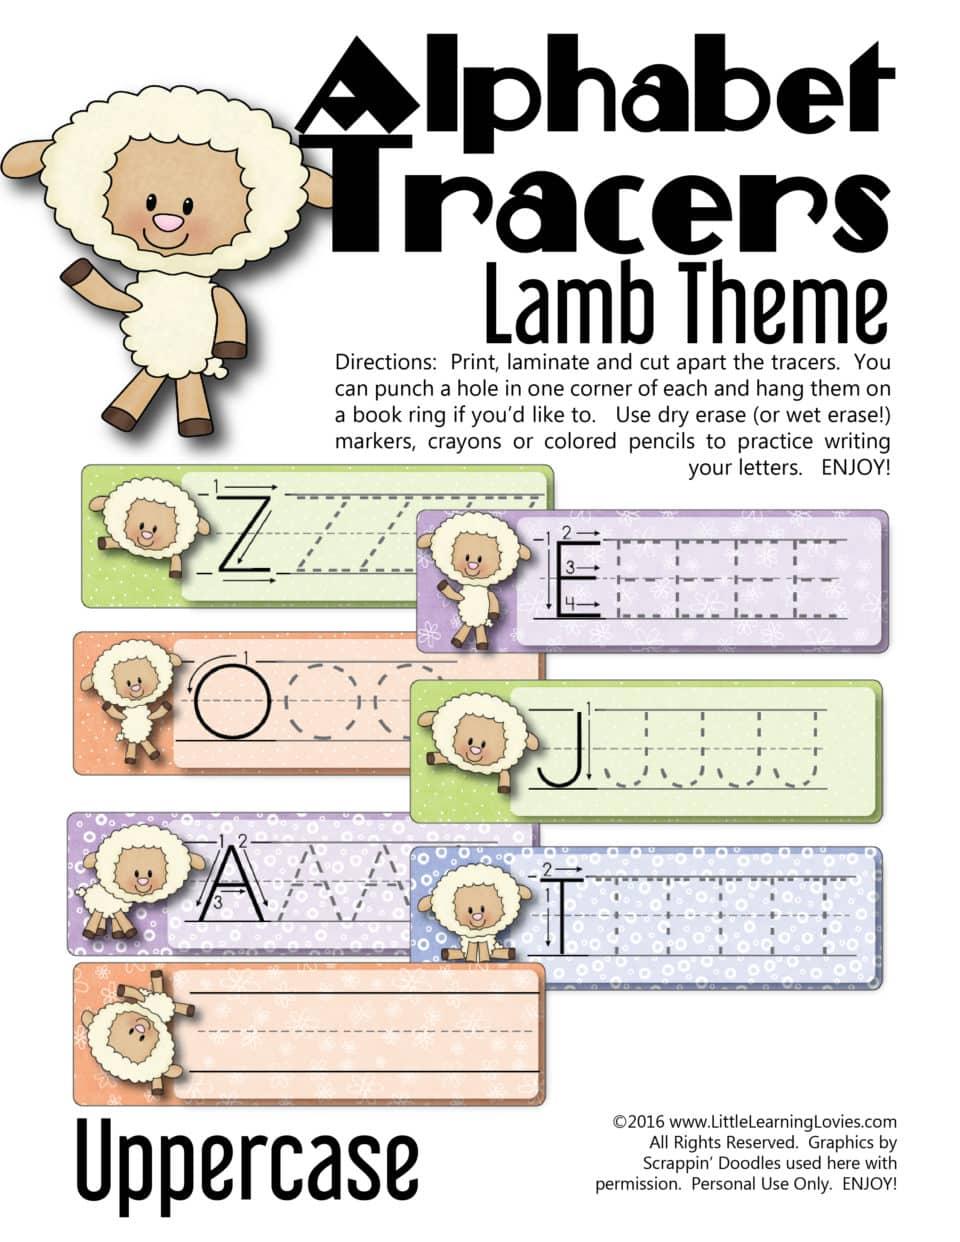 LambThemed-AlphabetTracers Uppercase-01